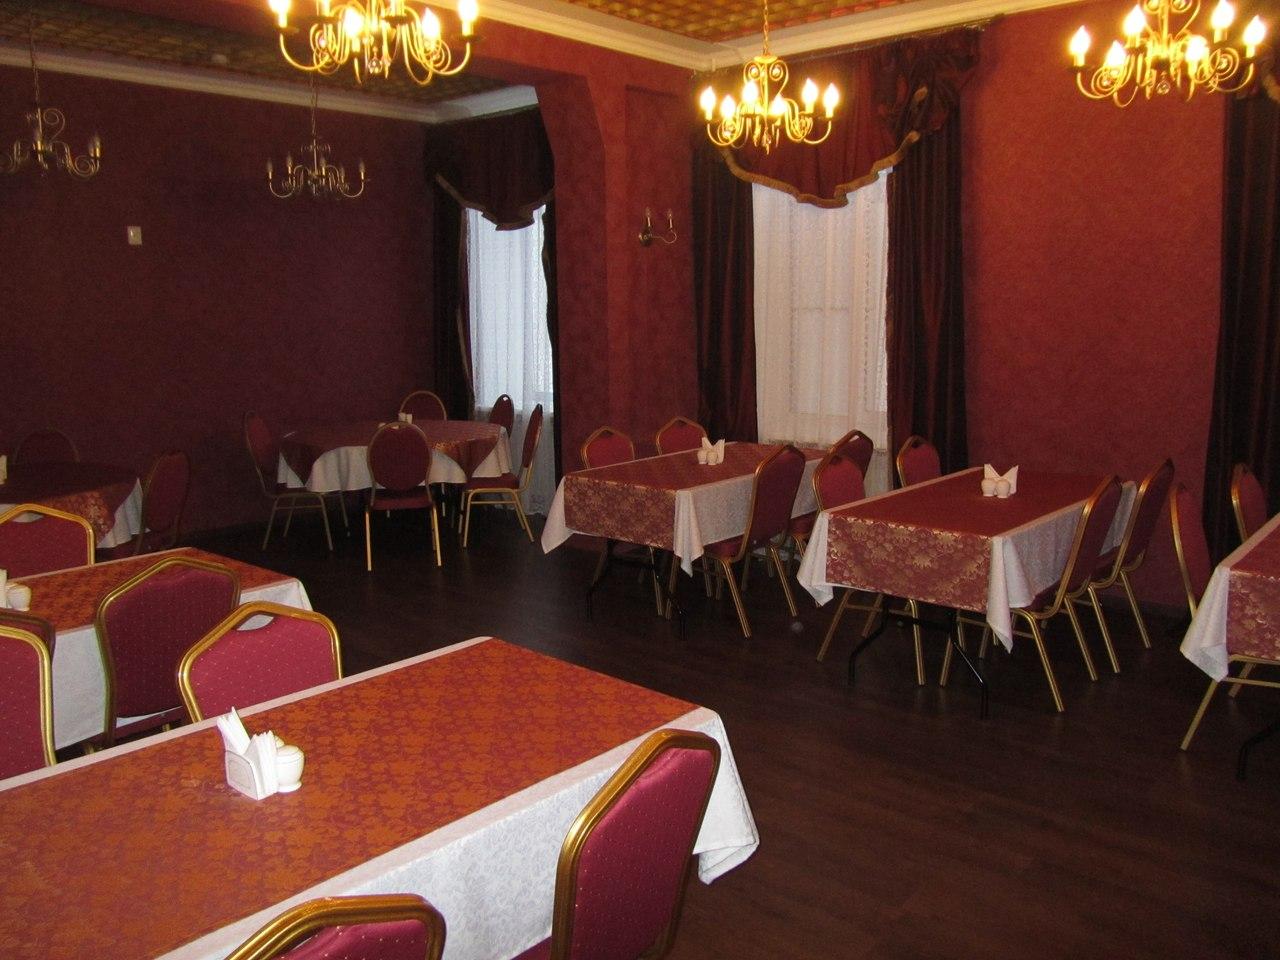 Ресторан Визави. Екатеринбург Татищева, 86, отель «Визави»